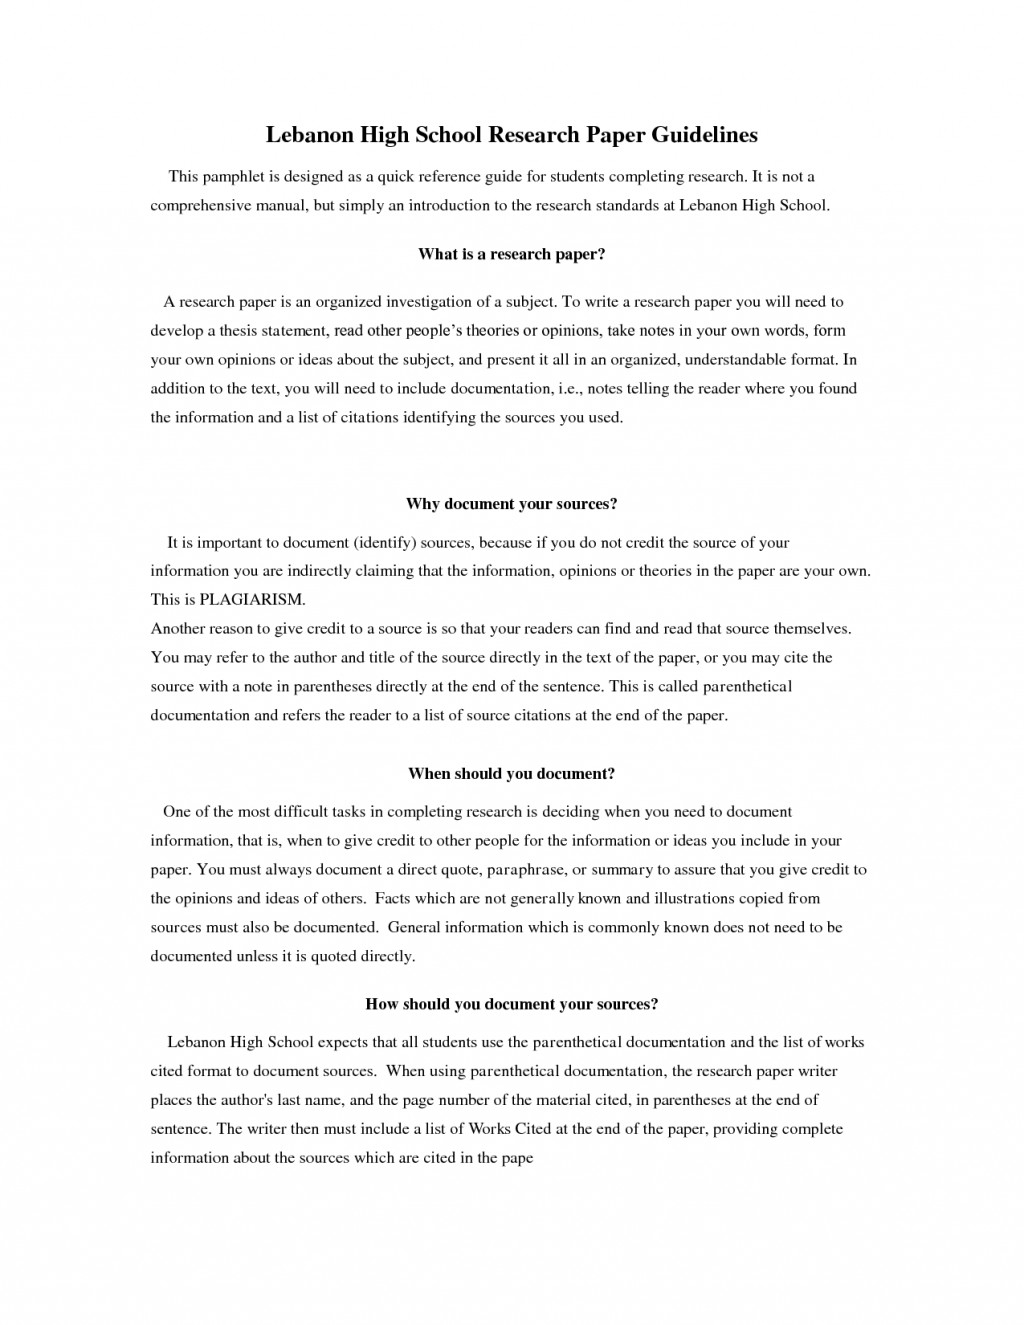 005 Us History Essay Topics Rare Ap Regents Dbq All Thematic Large